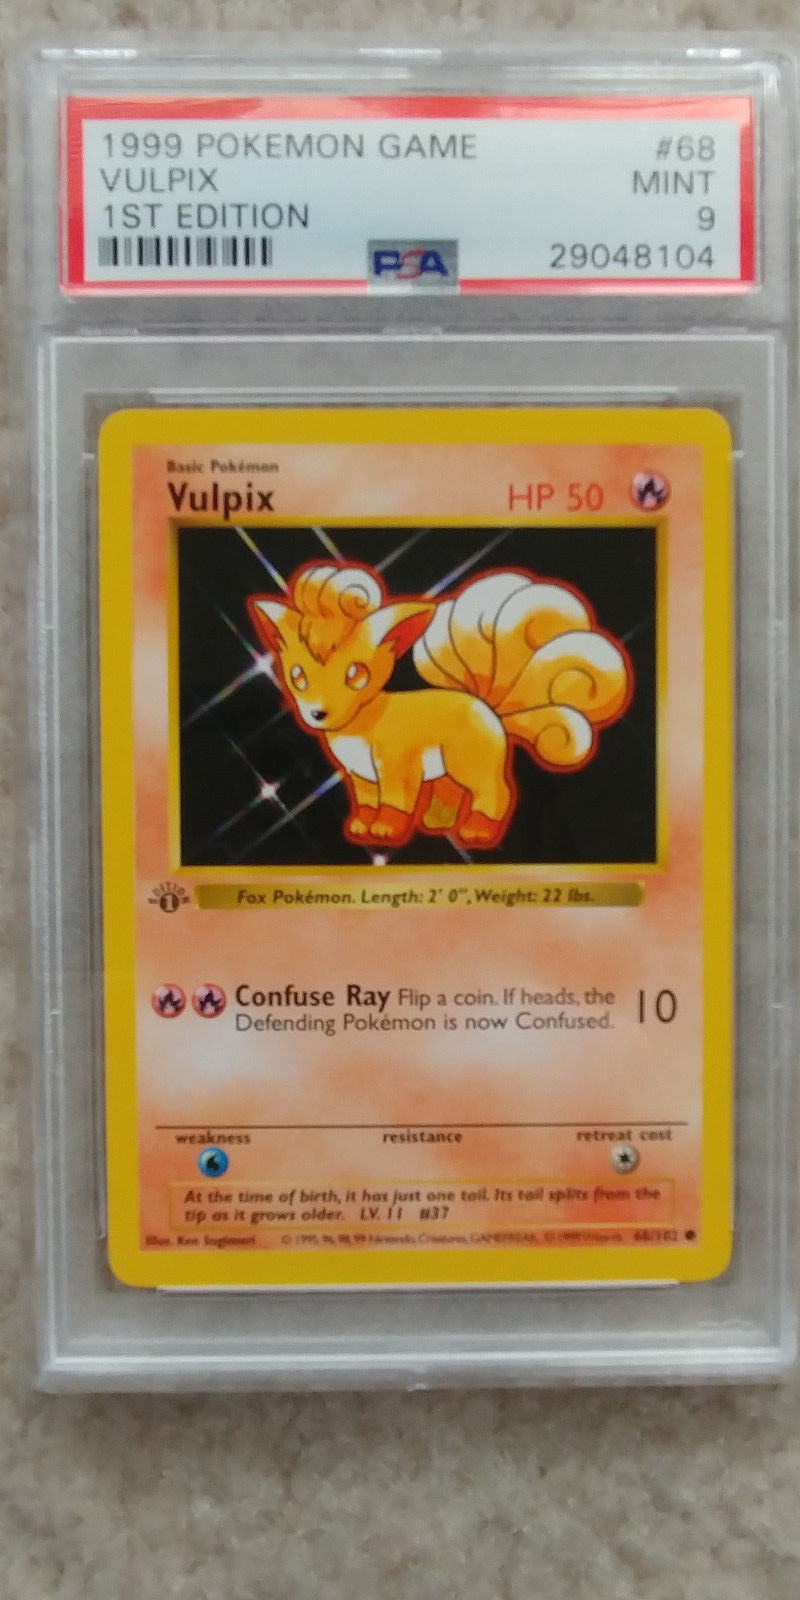 Pokemon Vulpix 68/102 1st Edition Base Set PSA 9 1999 Pokemon Game Shadowless